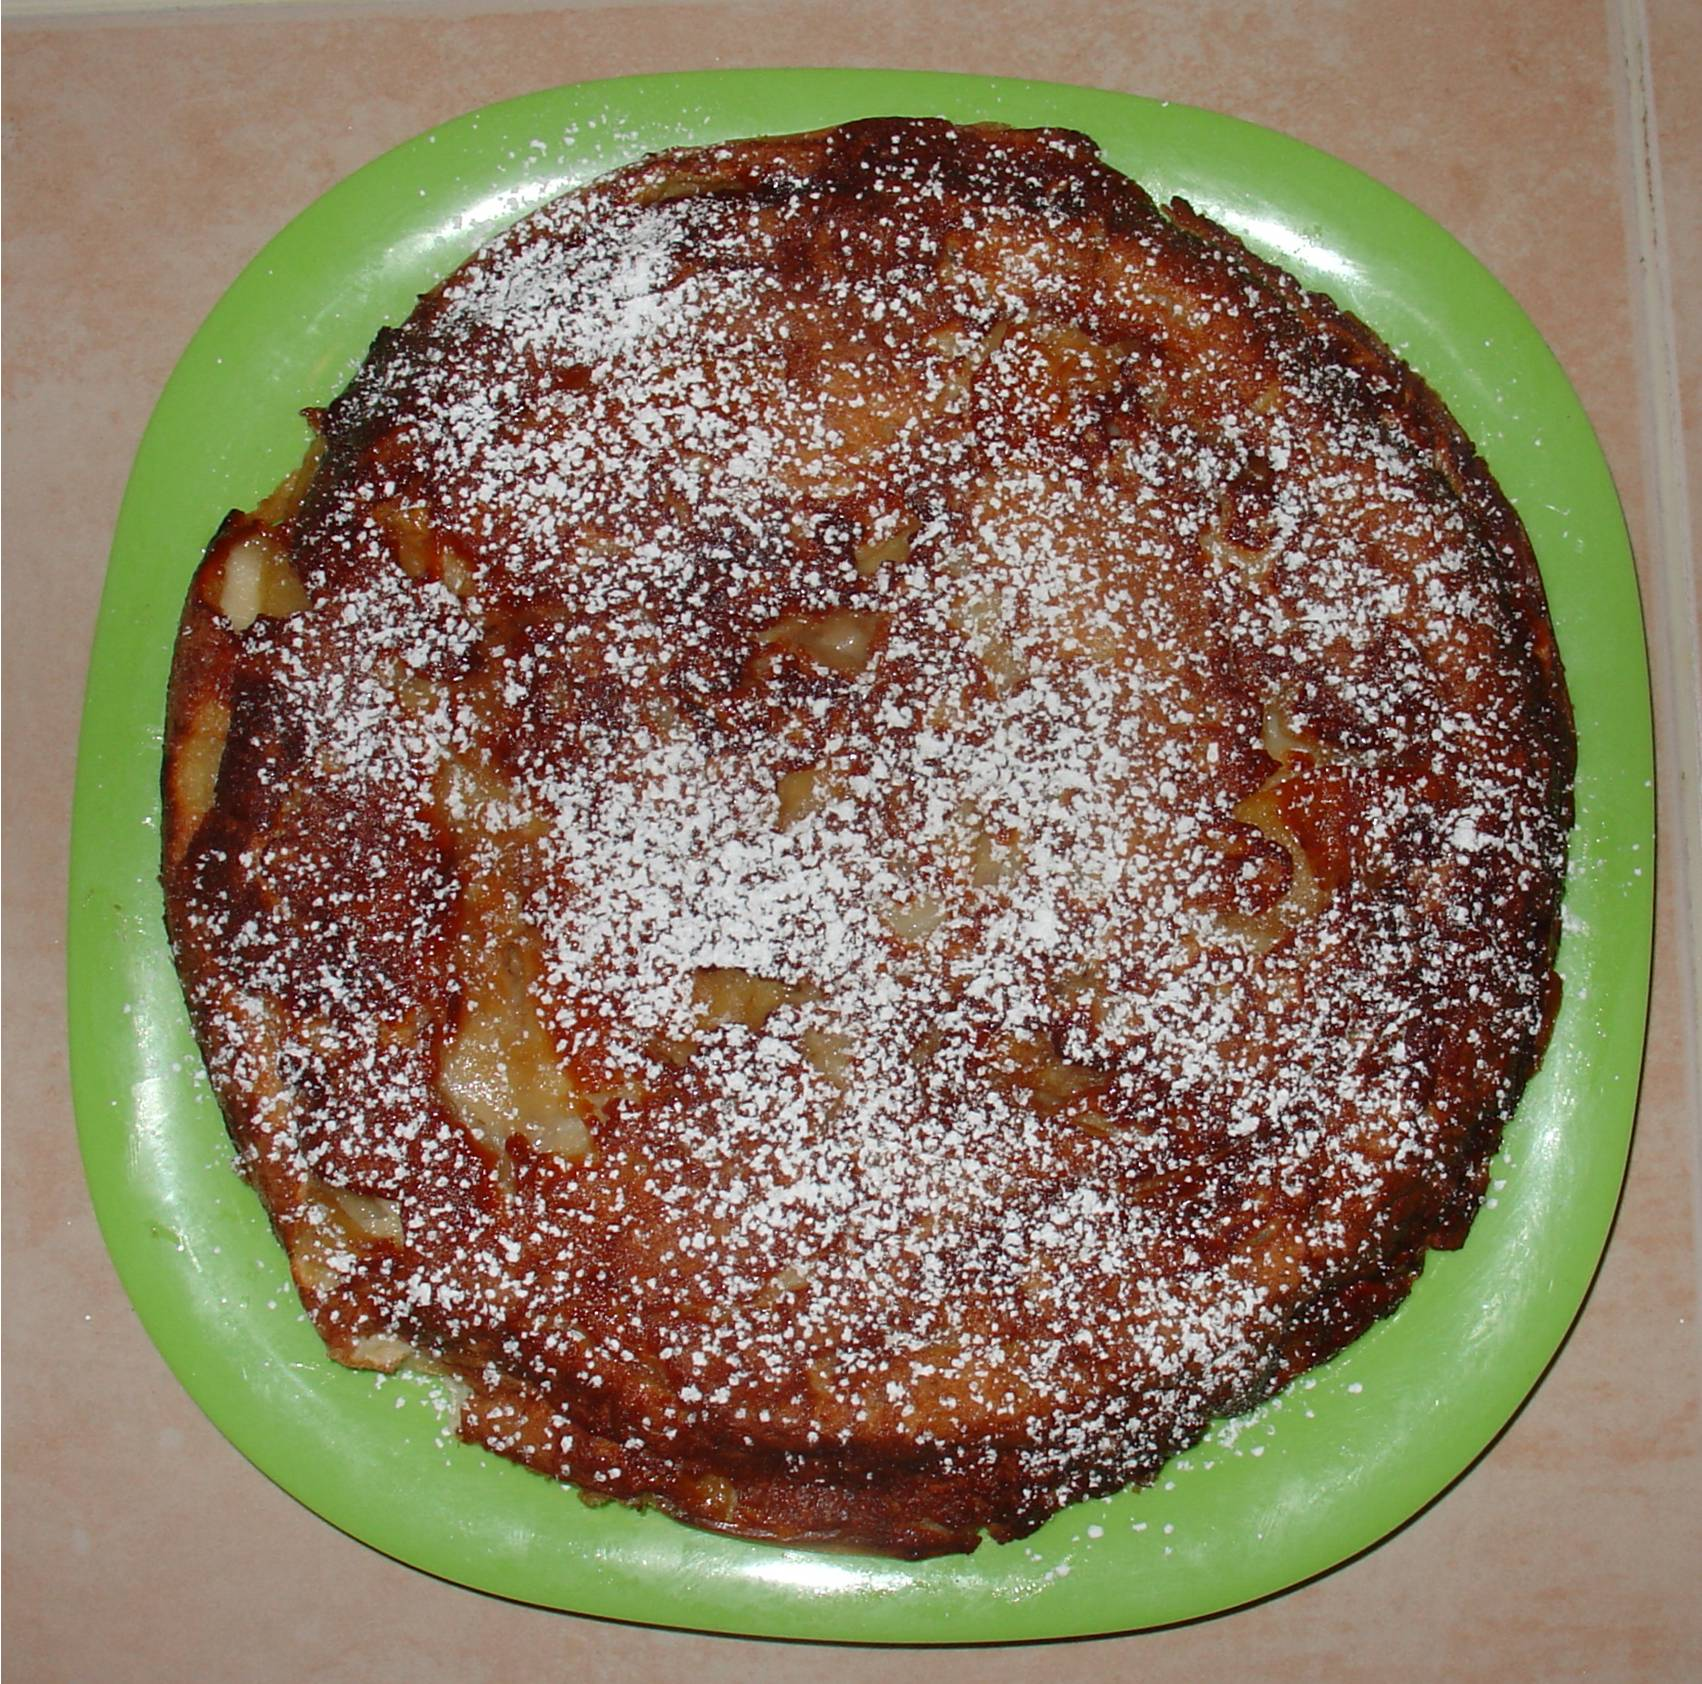 Puffed Swedish Pancake